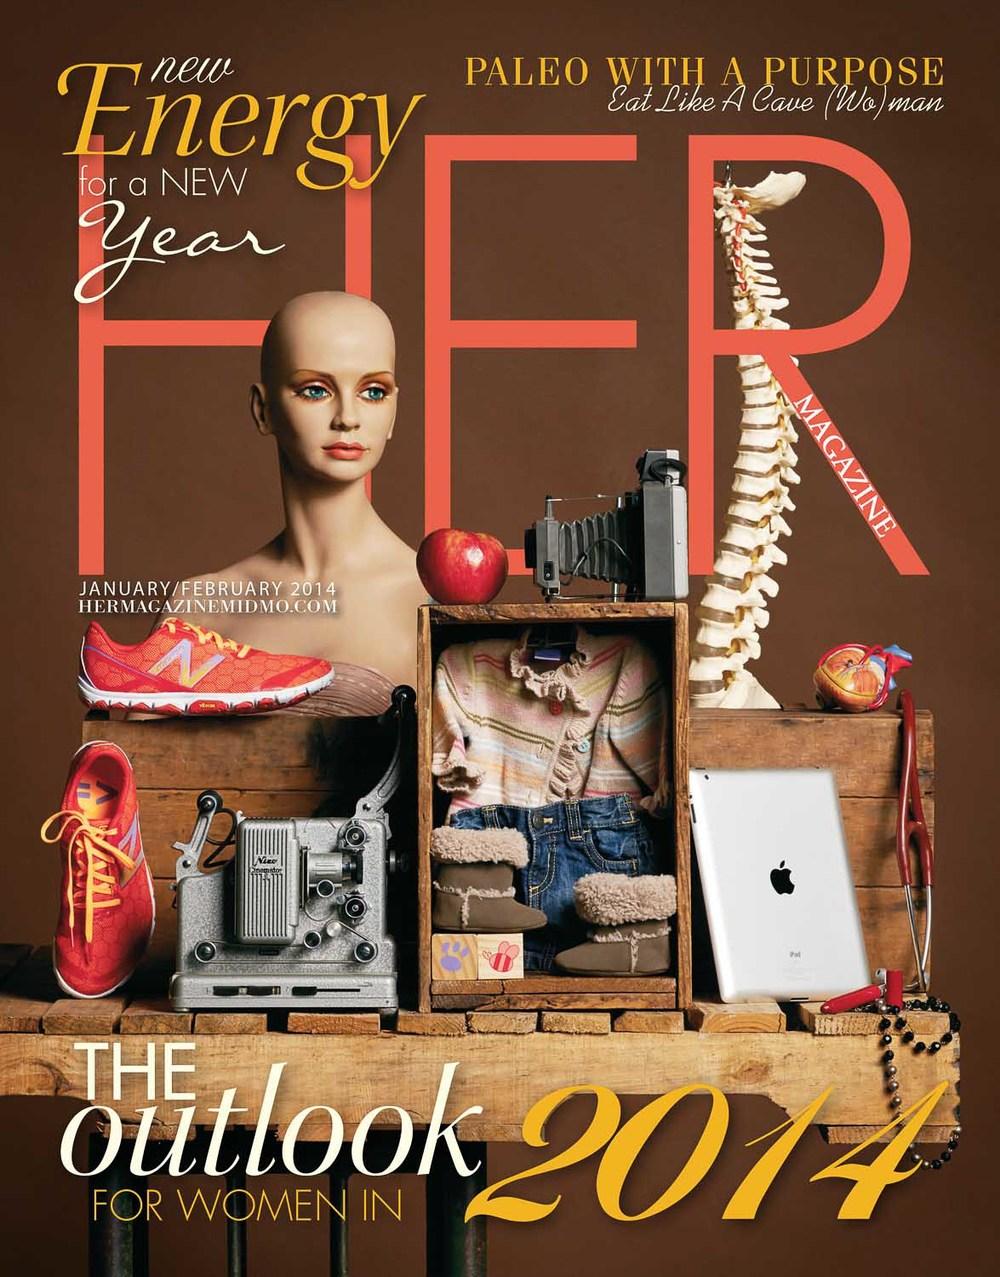 Jefferson City, Missouri, Commerical, Editorial, Advertising, Photographer, Photogrpahy 0020.jpg